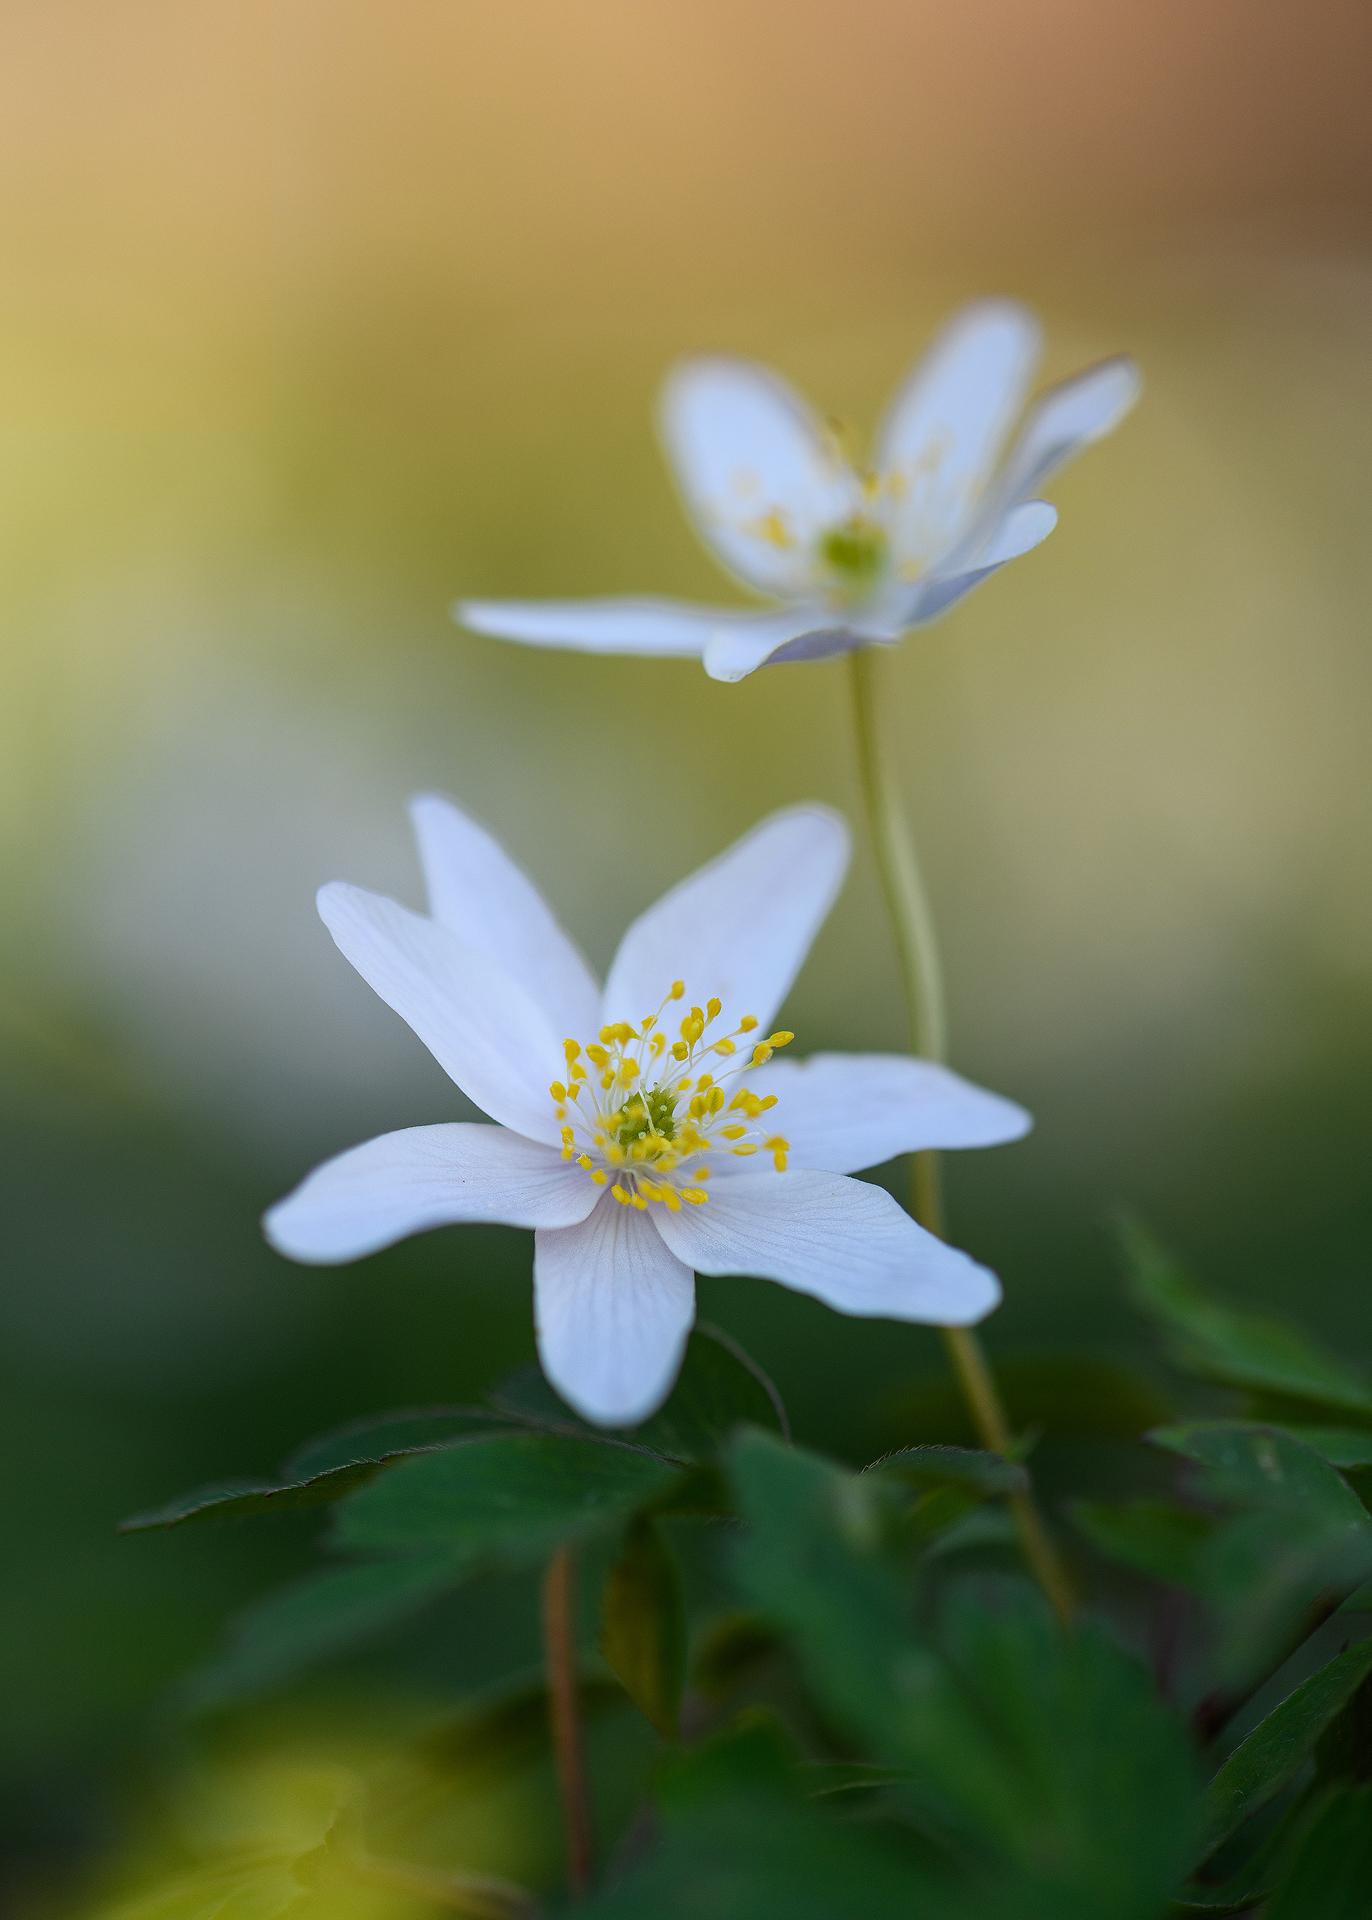 Anemone Still Life